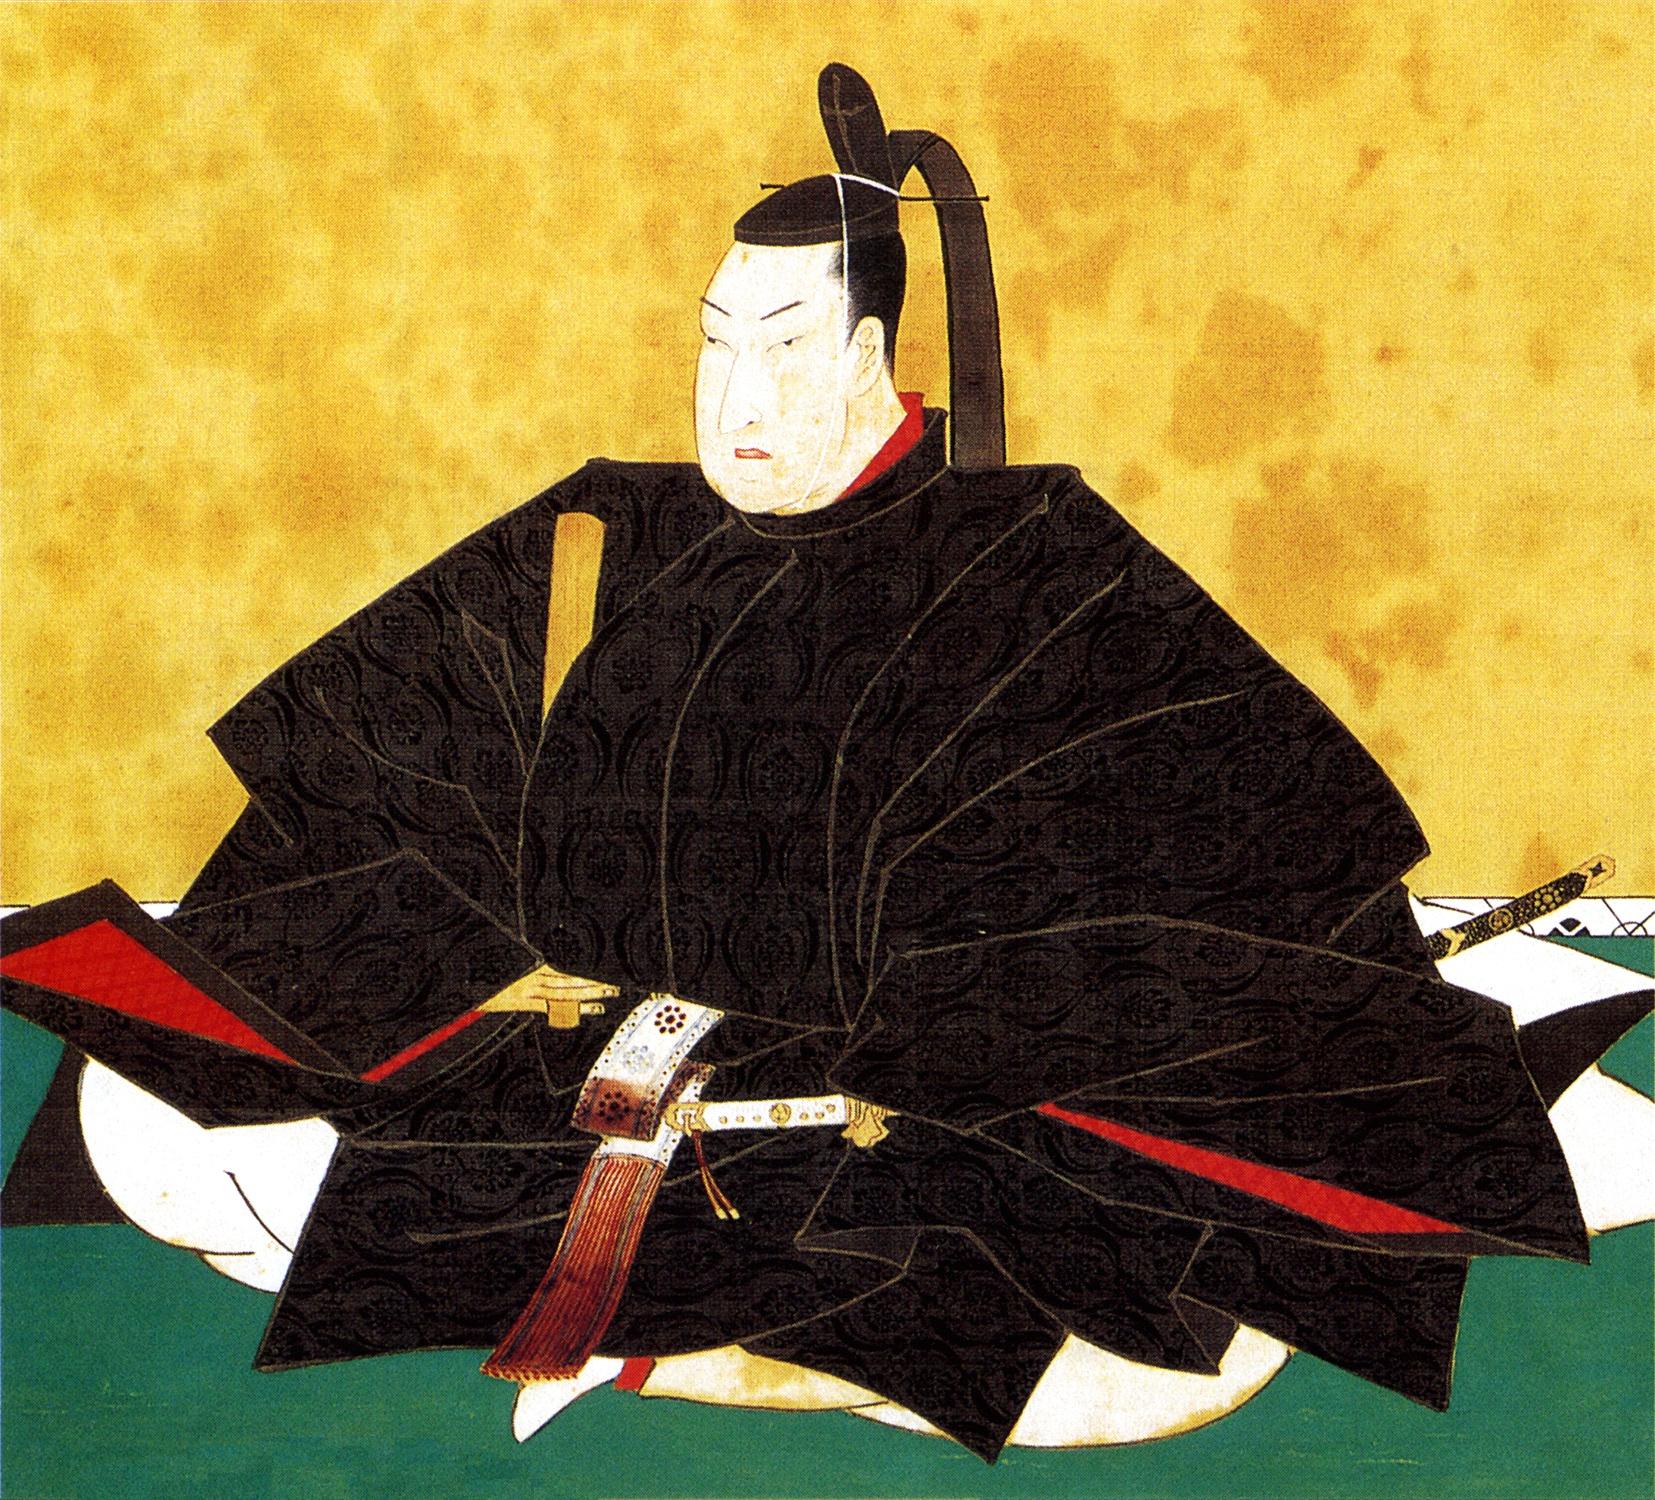 http://upload.wikimedia.org/wikipedia/commons/d/d9/Tsunyaoshi.jpg